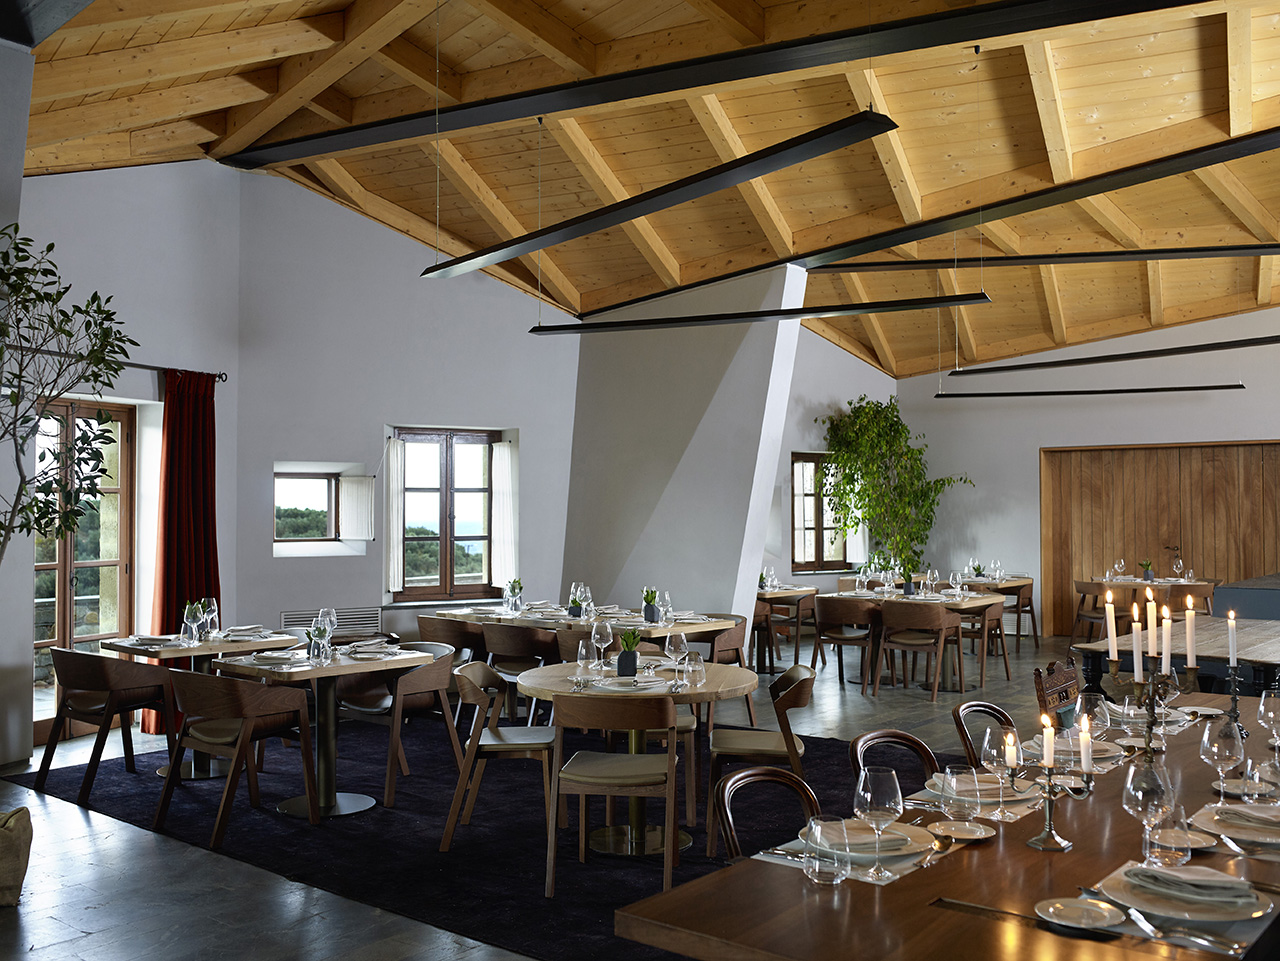 'Mouries' restaurant at Kinsterna'snewly built annex. Photo byVangelis Paterakis © Kinsterna Hotel.